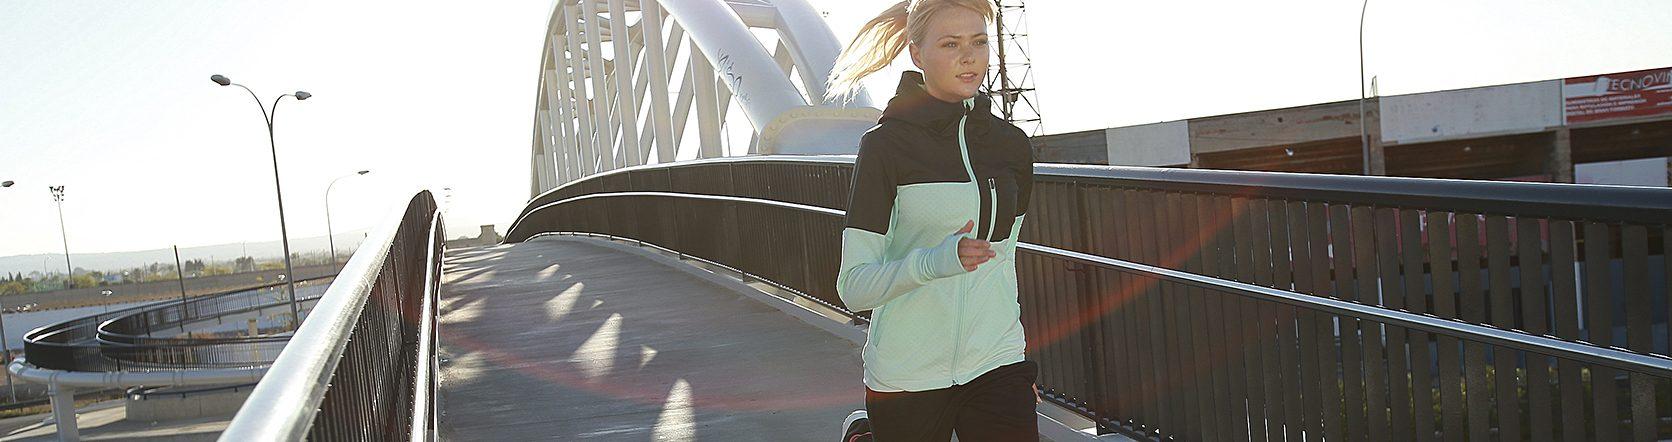 Trainingsplan: 10 km laufen